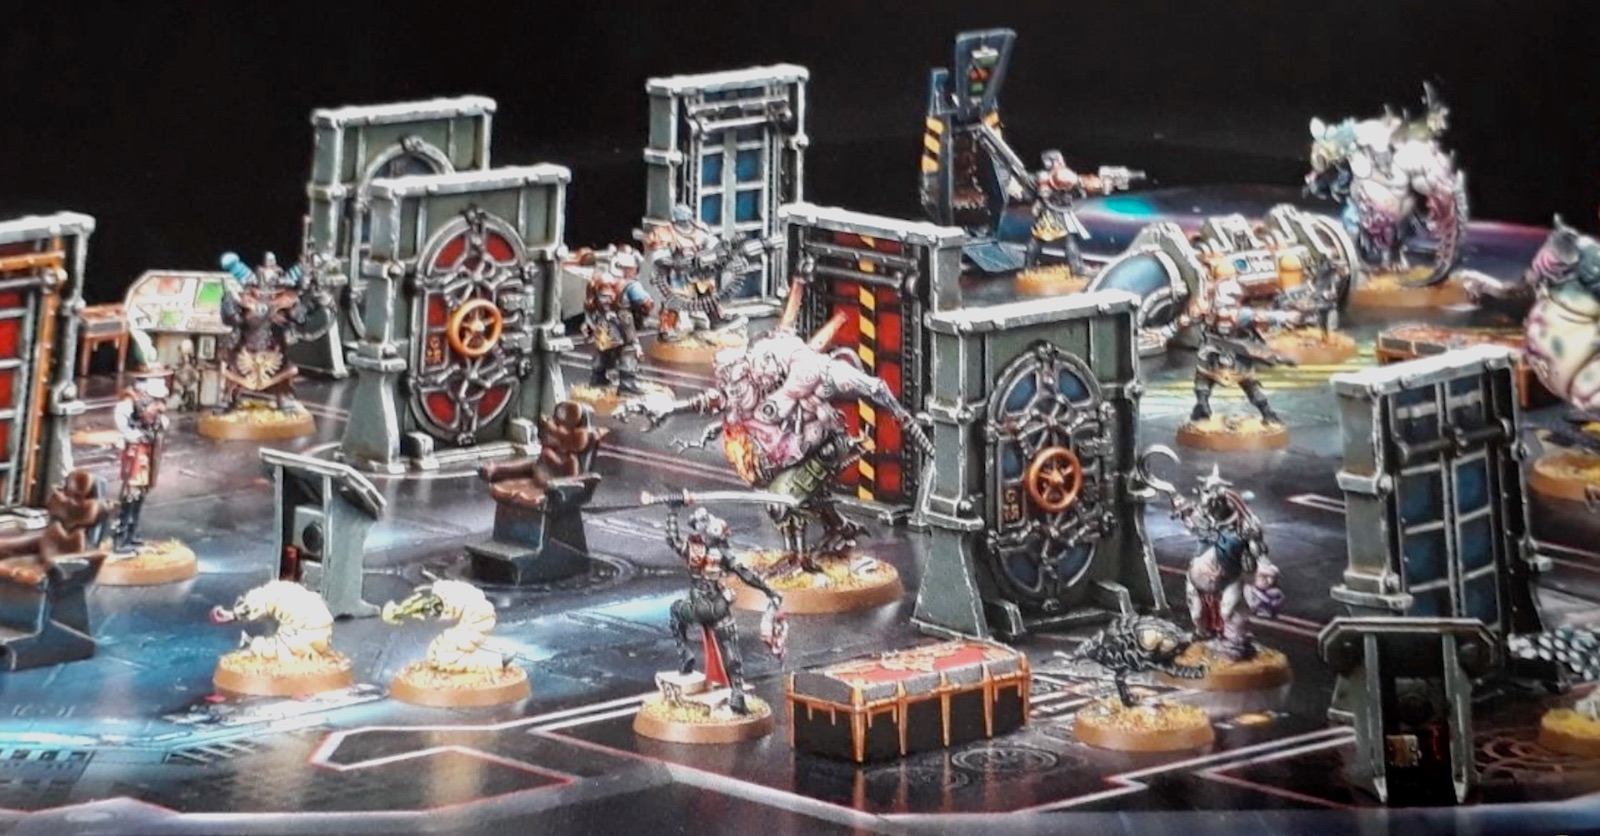 40K BREAKING: Rogue Trader Box Game Pics Leak - New Minis Inbound